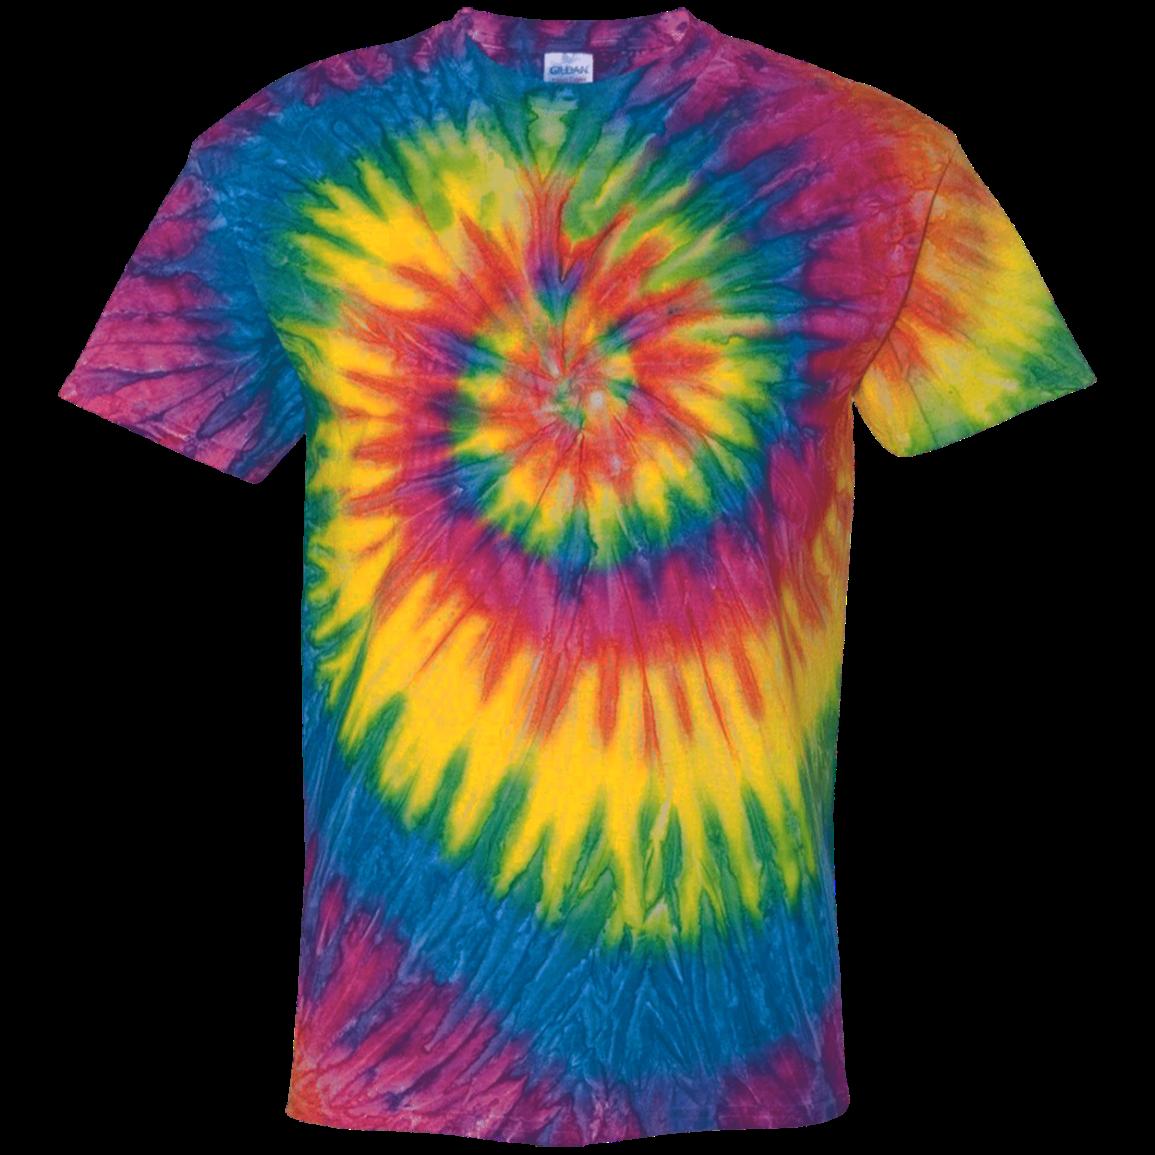 593aa52b Custom 100% Cotton Tie Dye T-Shirt - SpiritShop.com